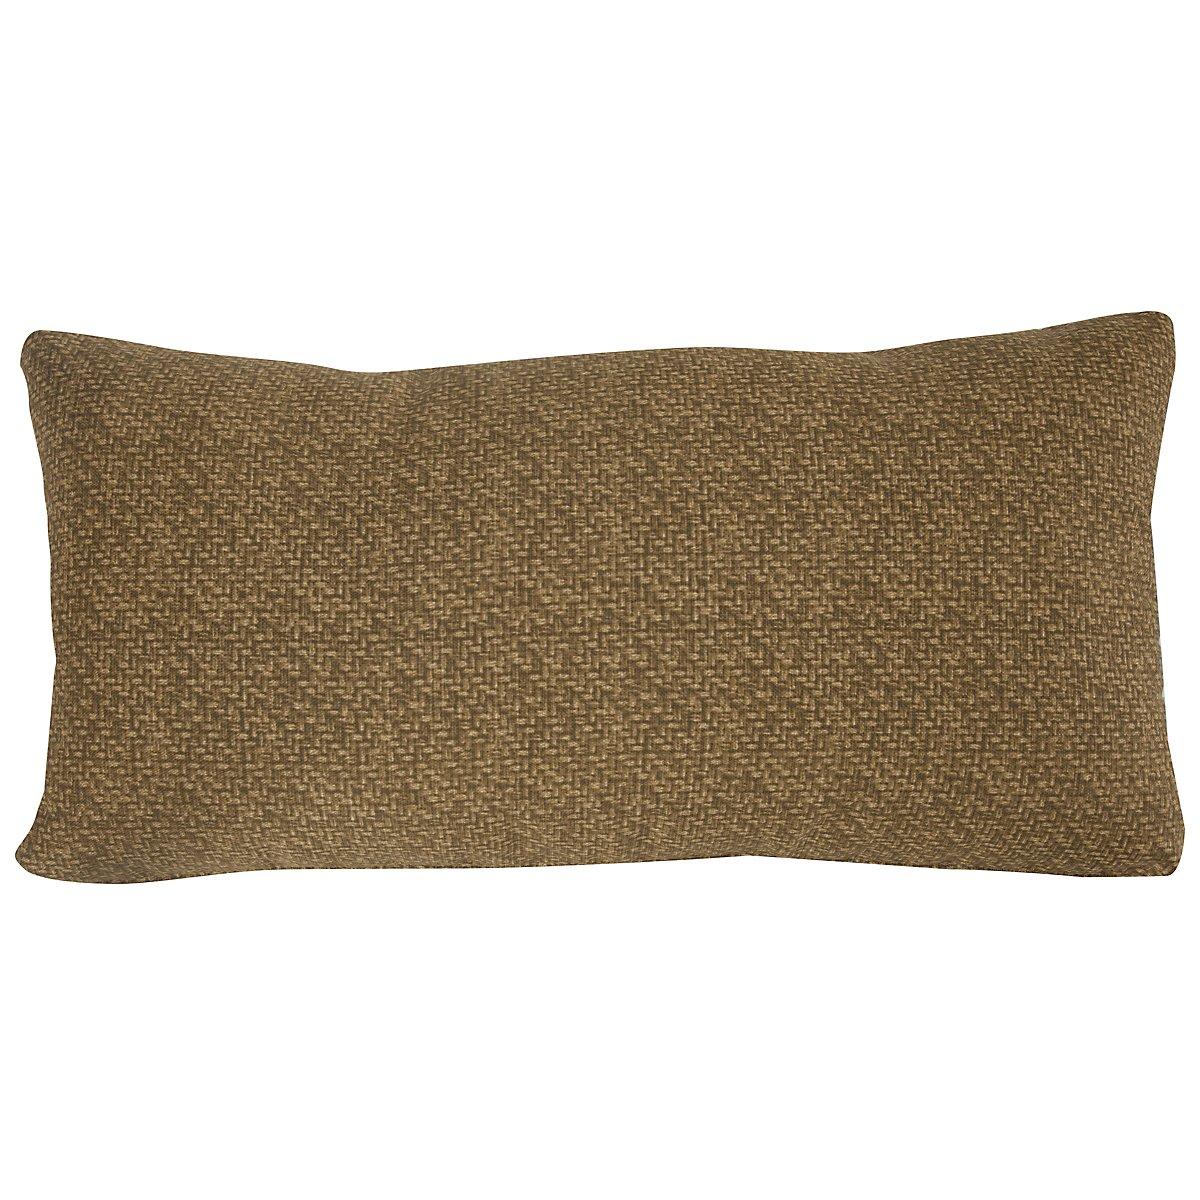 "Tempo Multicolored 26"" Indoor/Outdoor Rectangular Accent Pillow"